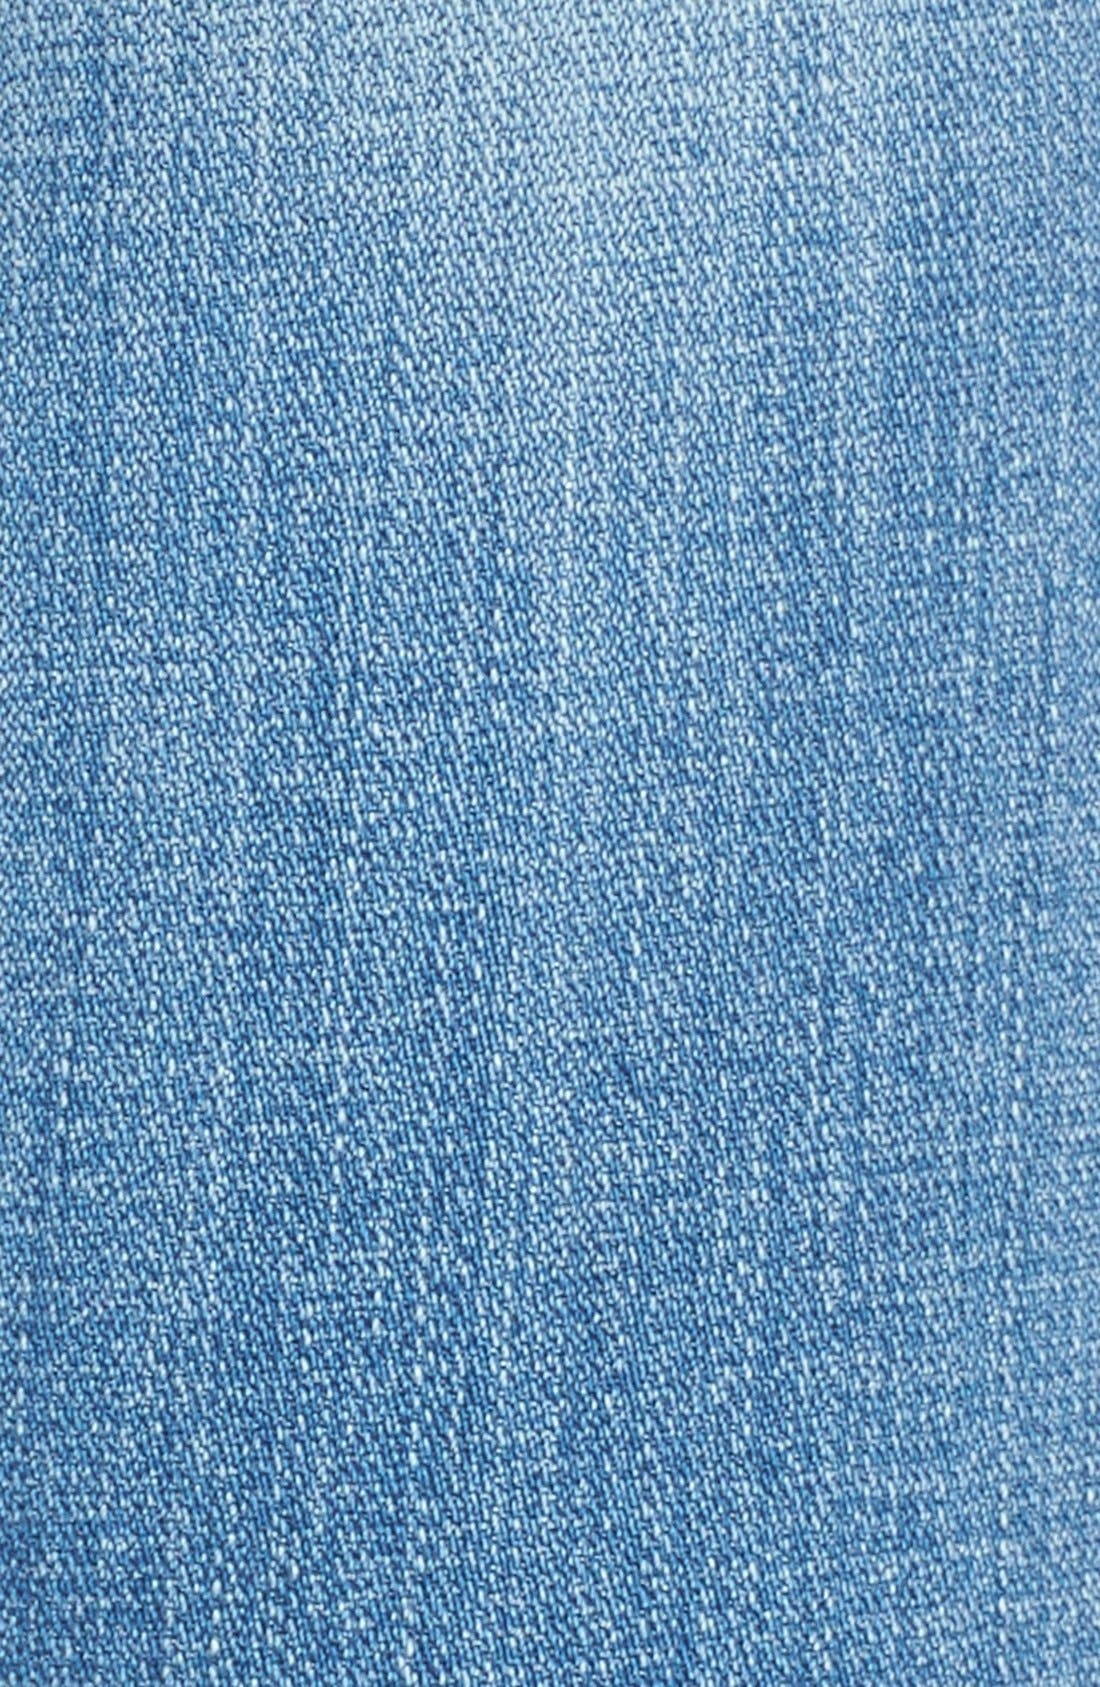 Alternate Image 5  - 7 For All Mankind® 'Josefina' Relaxed Skinny Jeans (Medium Broken Twill)